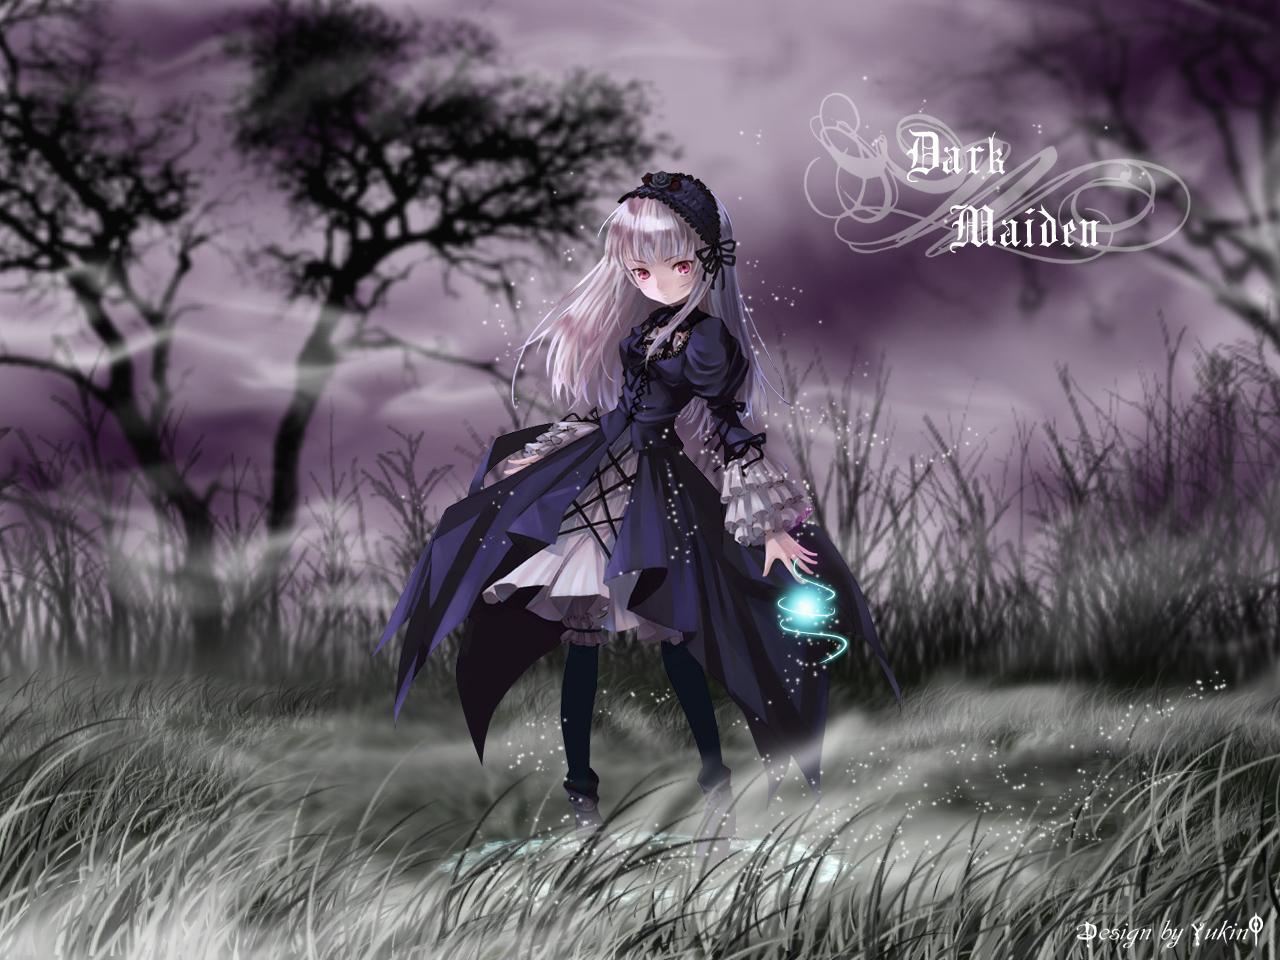 http://4.bp.blogspot.com/-8pDz88pUWCQ/TfjwRD9LeeI/AAAAAAAABrc/mfnO6pMwahM/s1600/DarkMaiden-Anime-Wallpaper.jpg